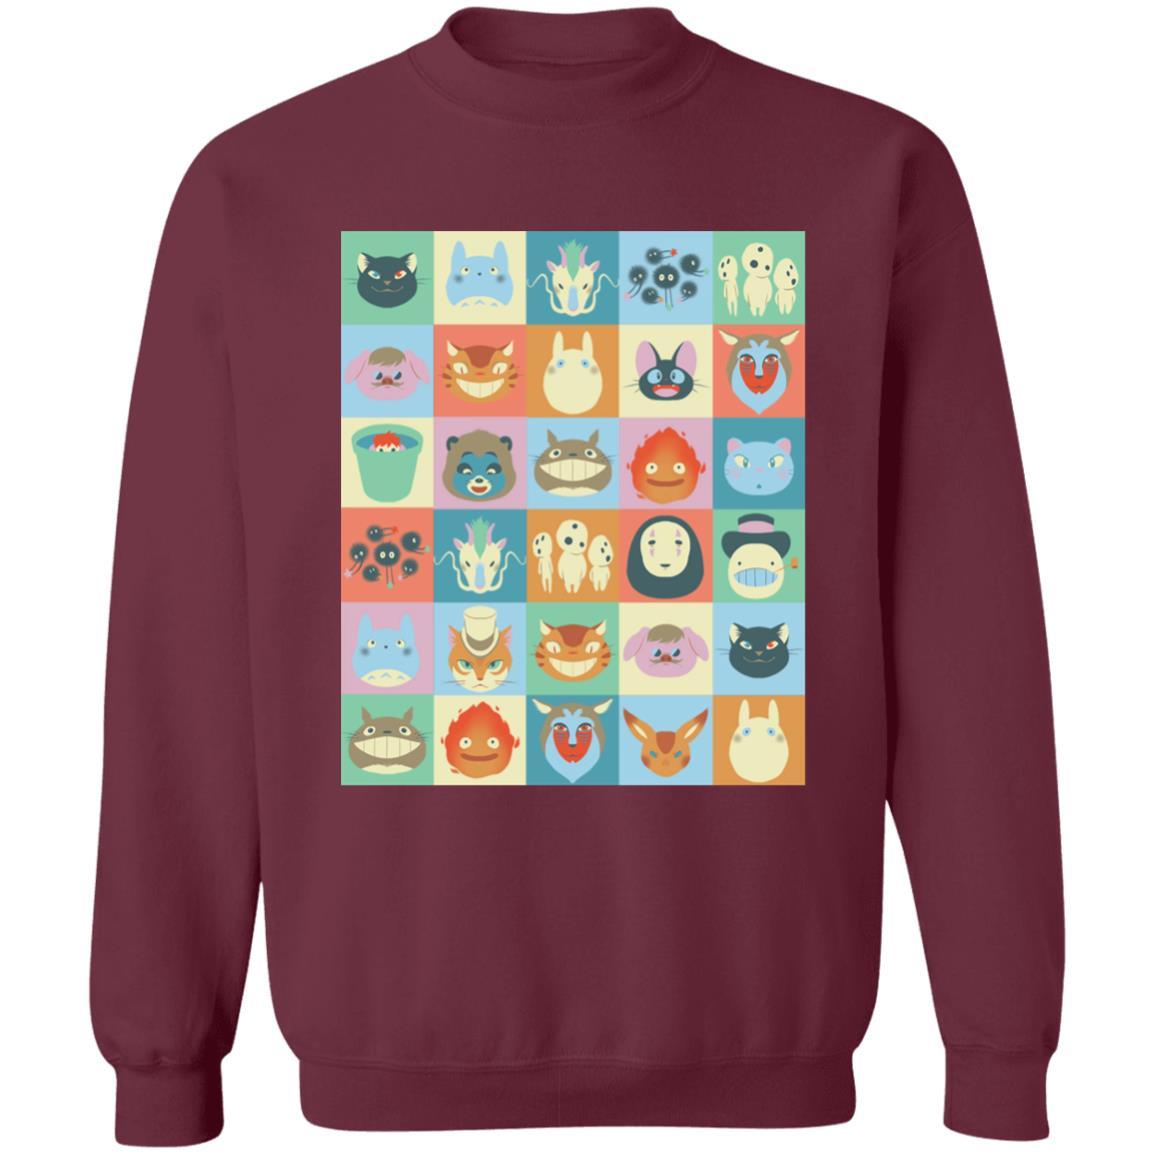 Ghibli Colorful Characters Collection Sweatshirt